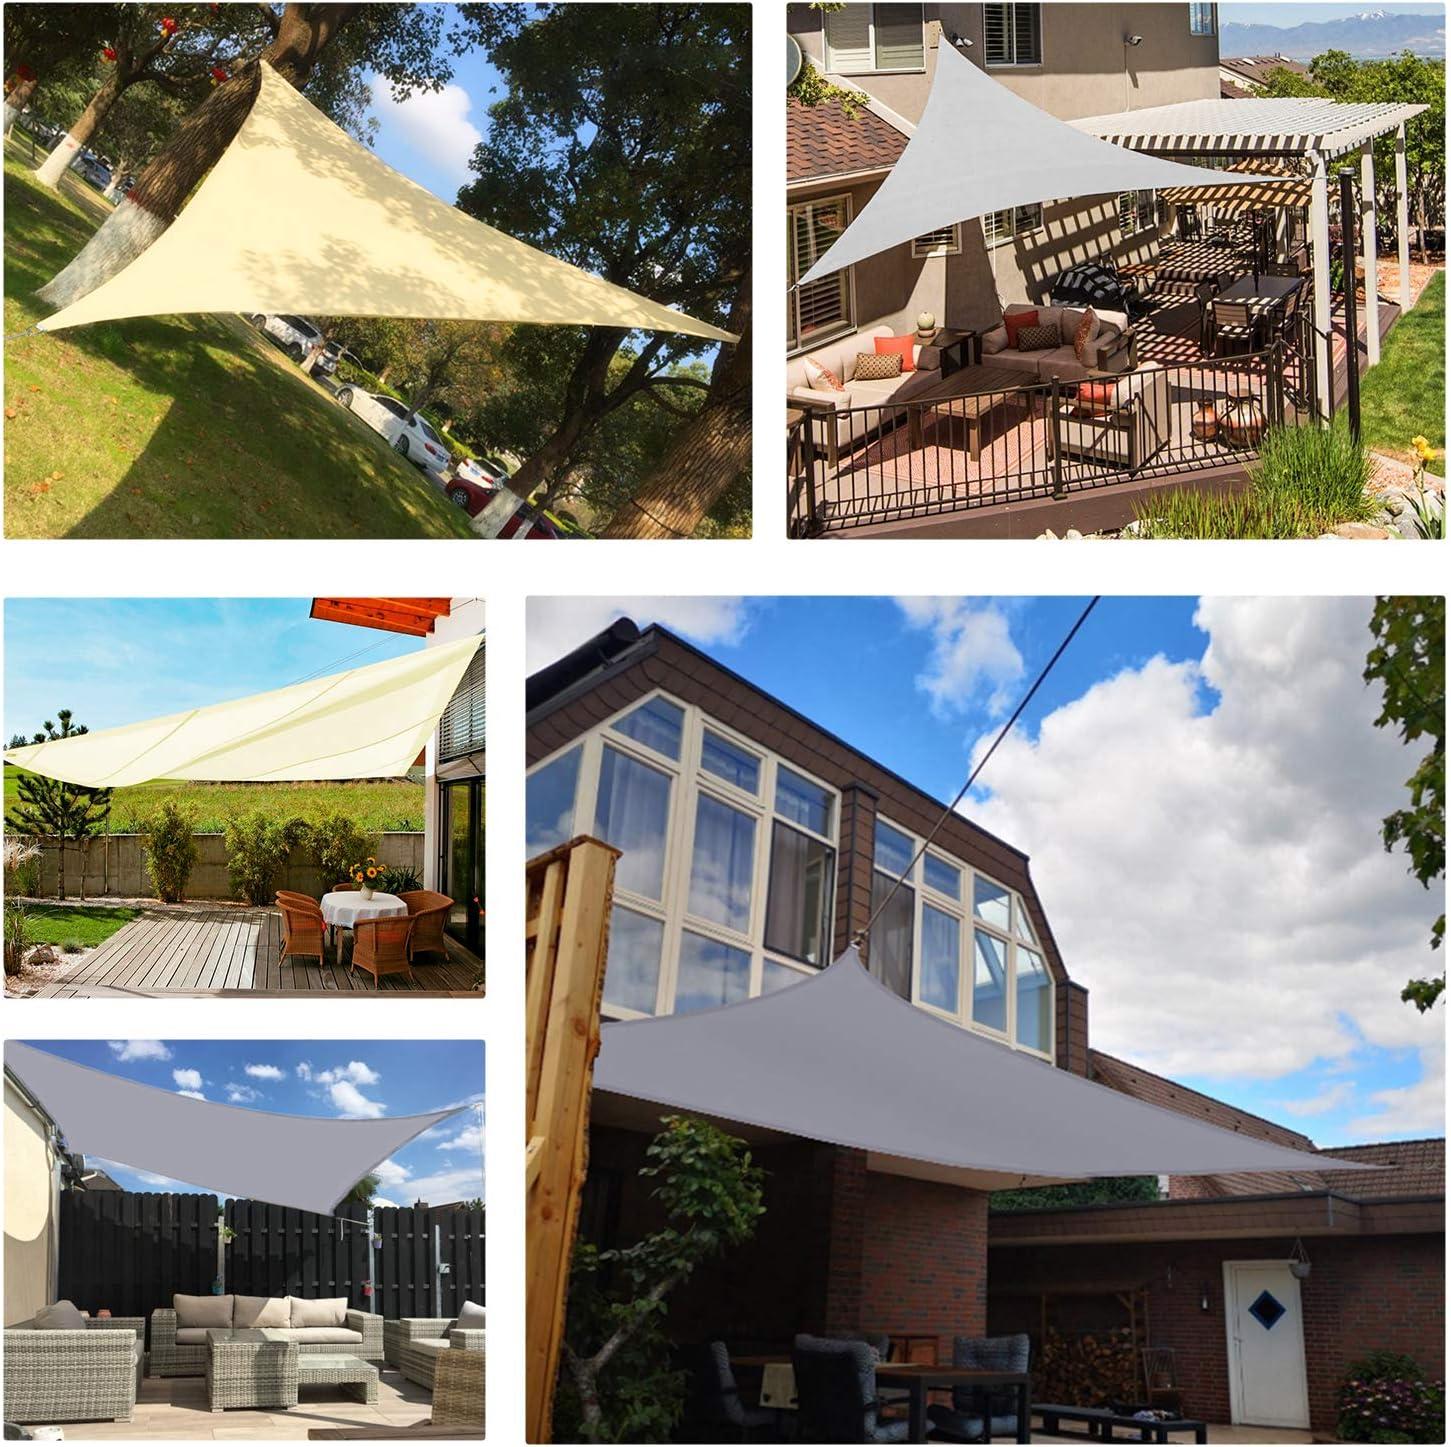 Waterproof UV Block Garden Patio Canopy for Outdoor Garden Patio 2 x 3m KONVINIT Sun Shade Sail Rectangle